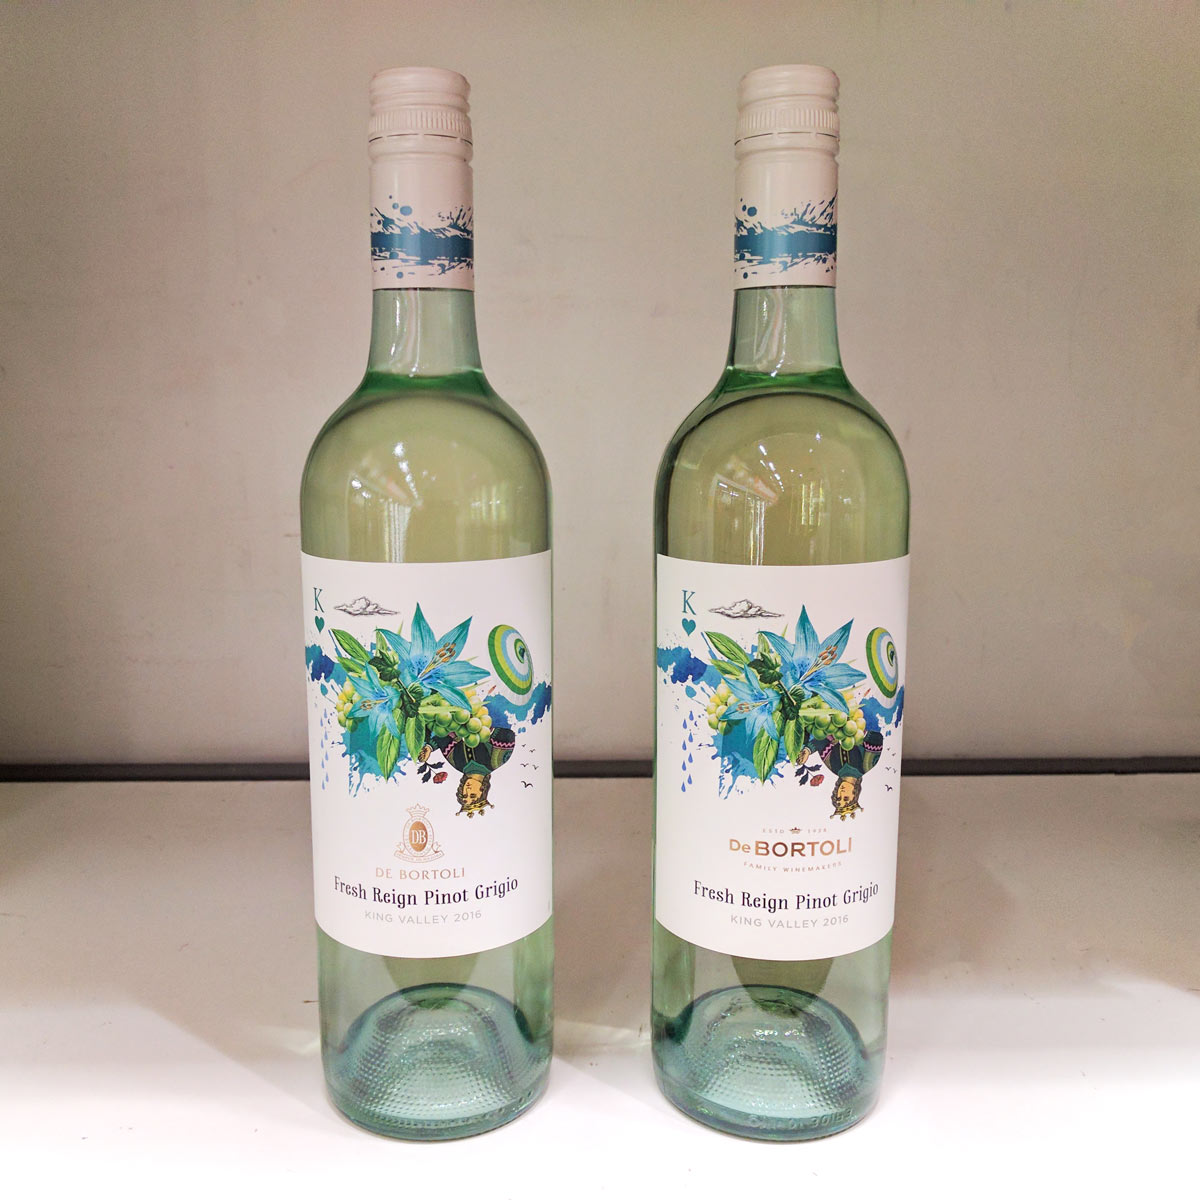 DeBortoli Pinot Grigio